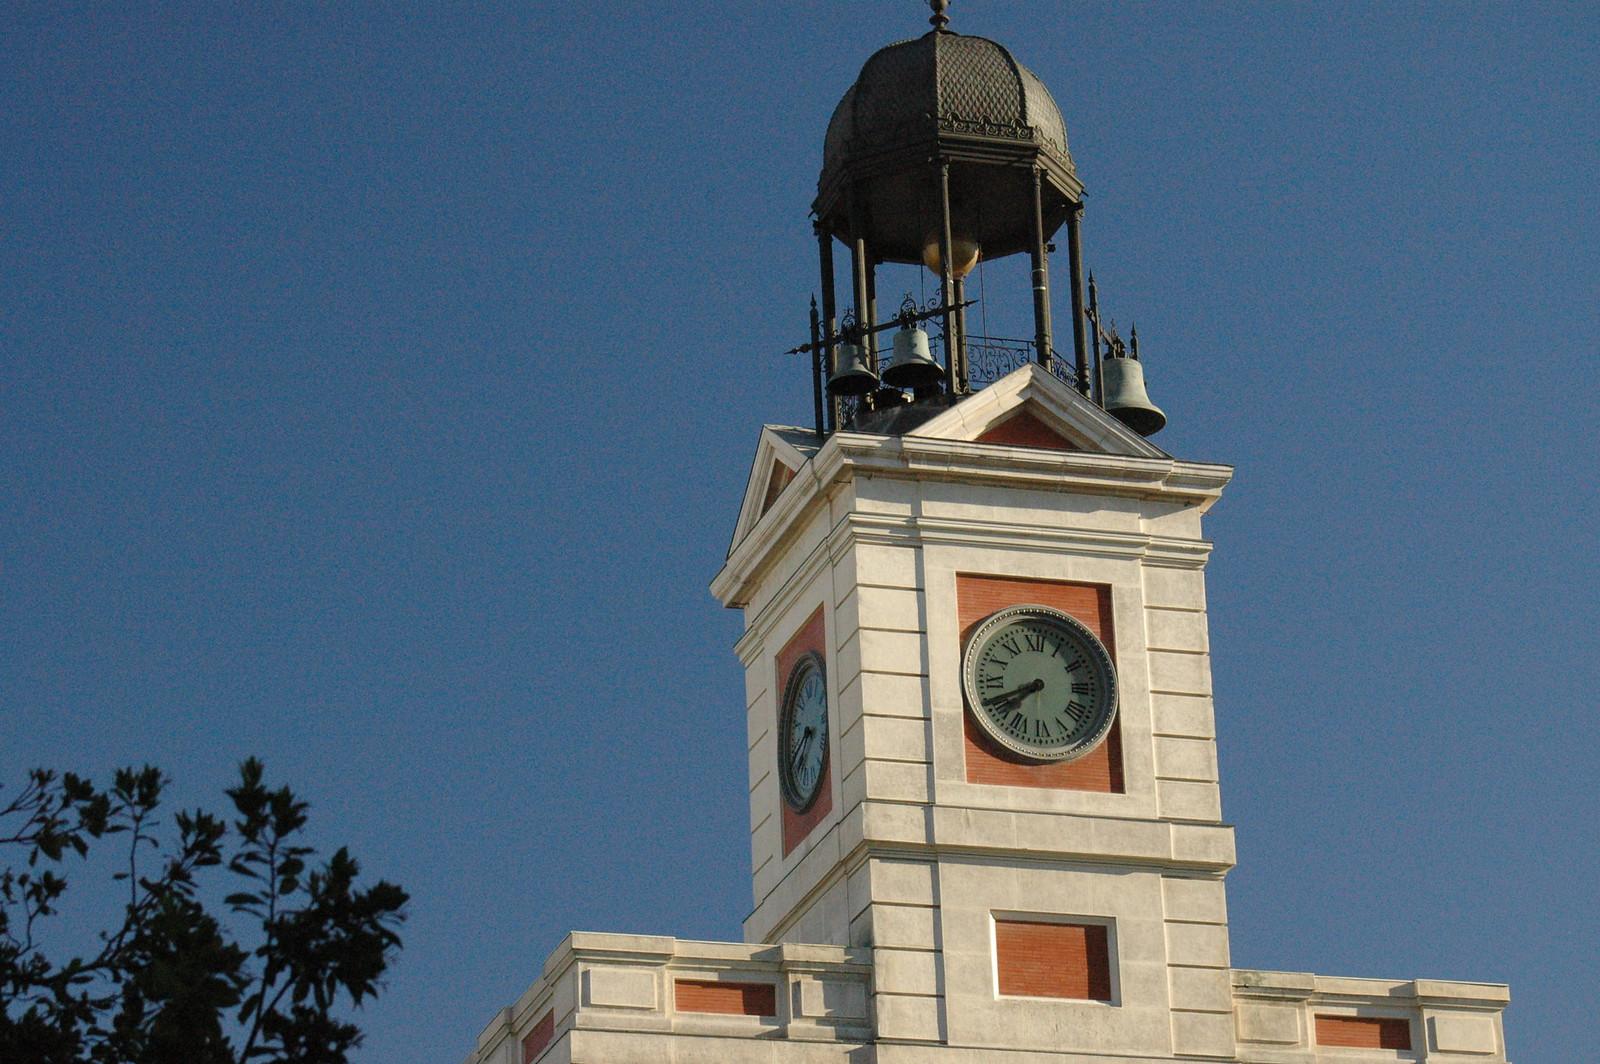 Reloj Puerta del Sol-Madrid